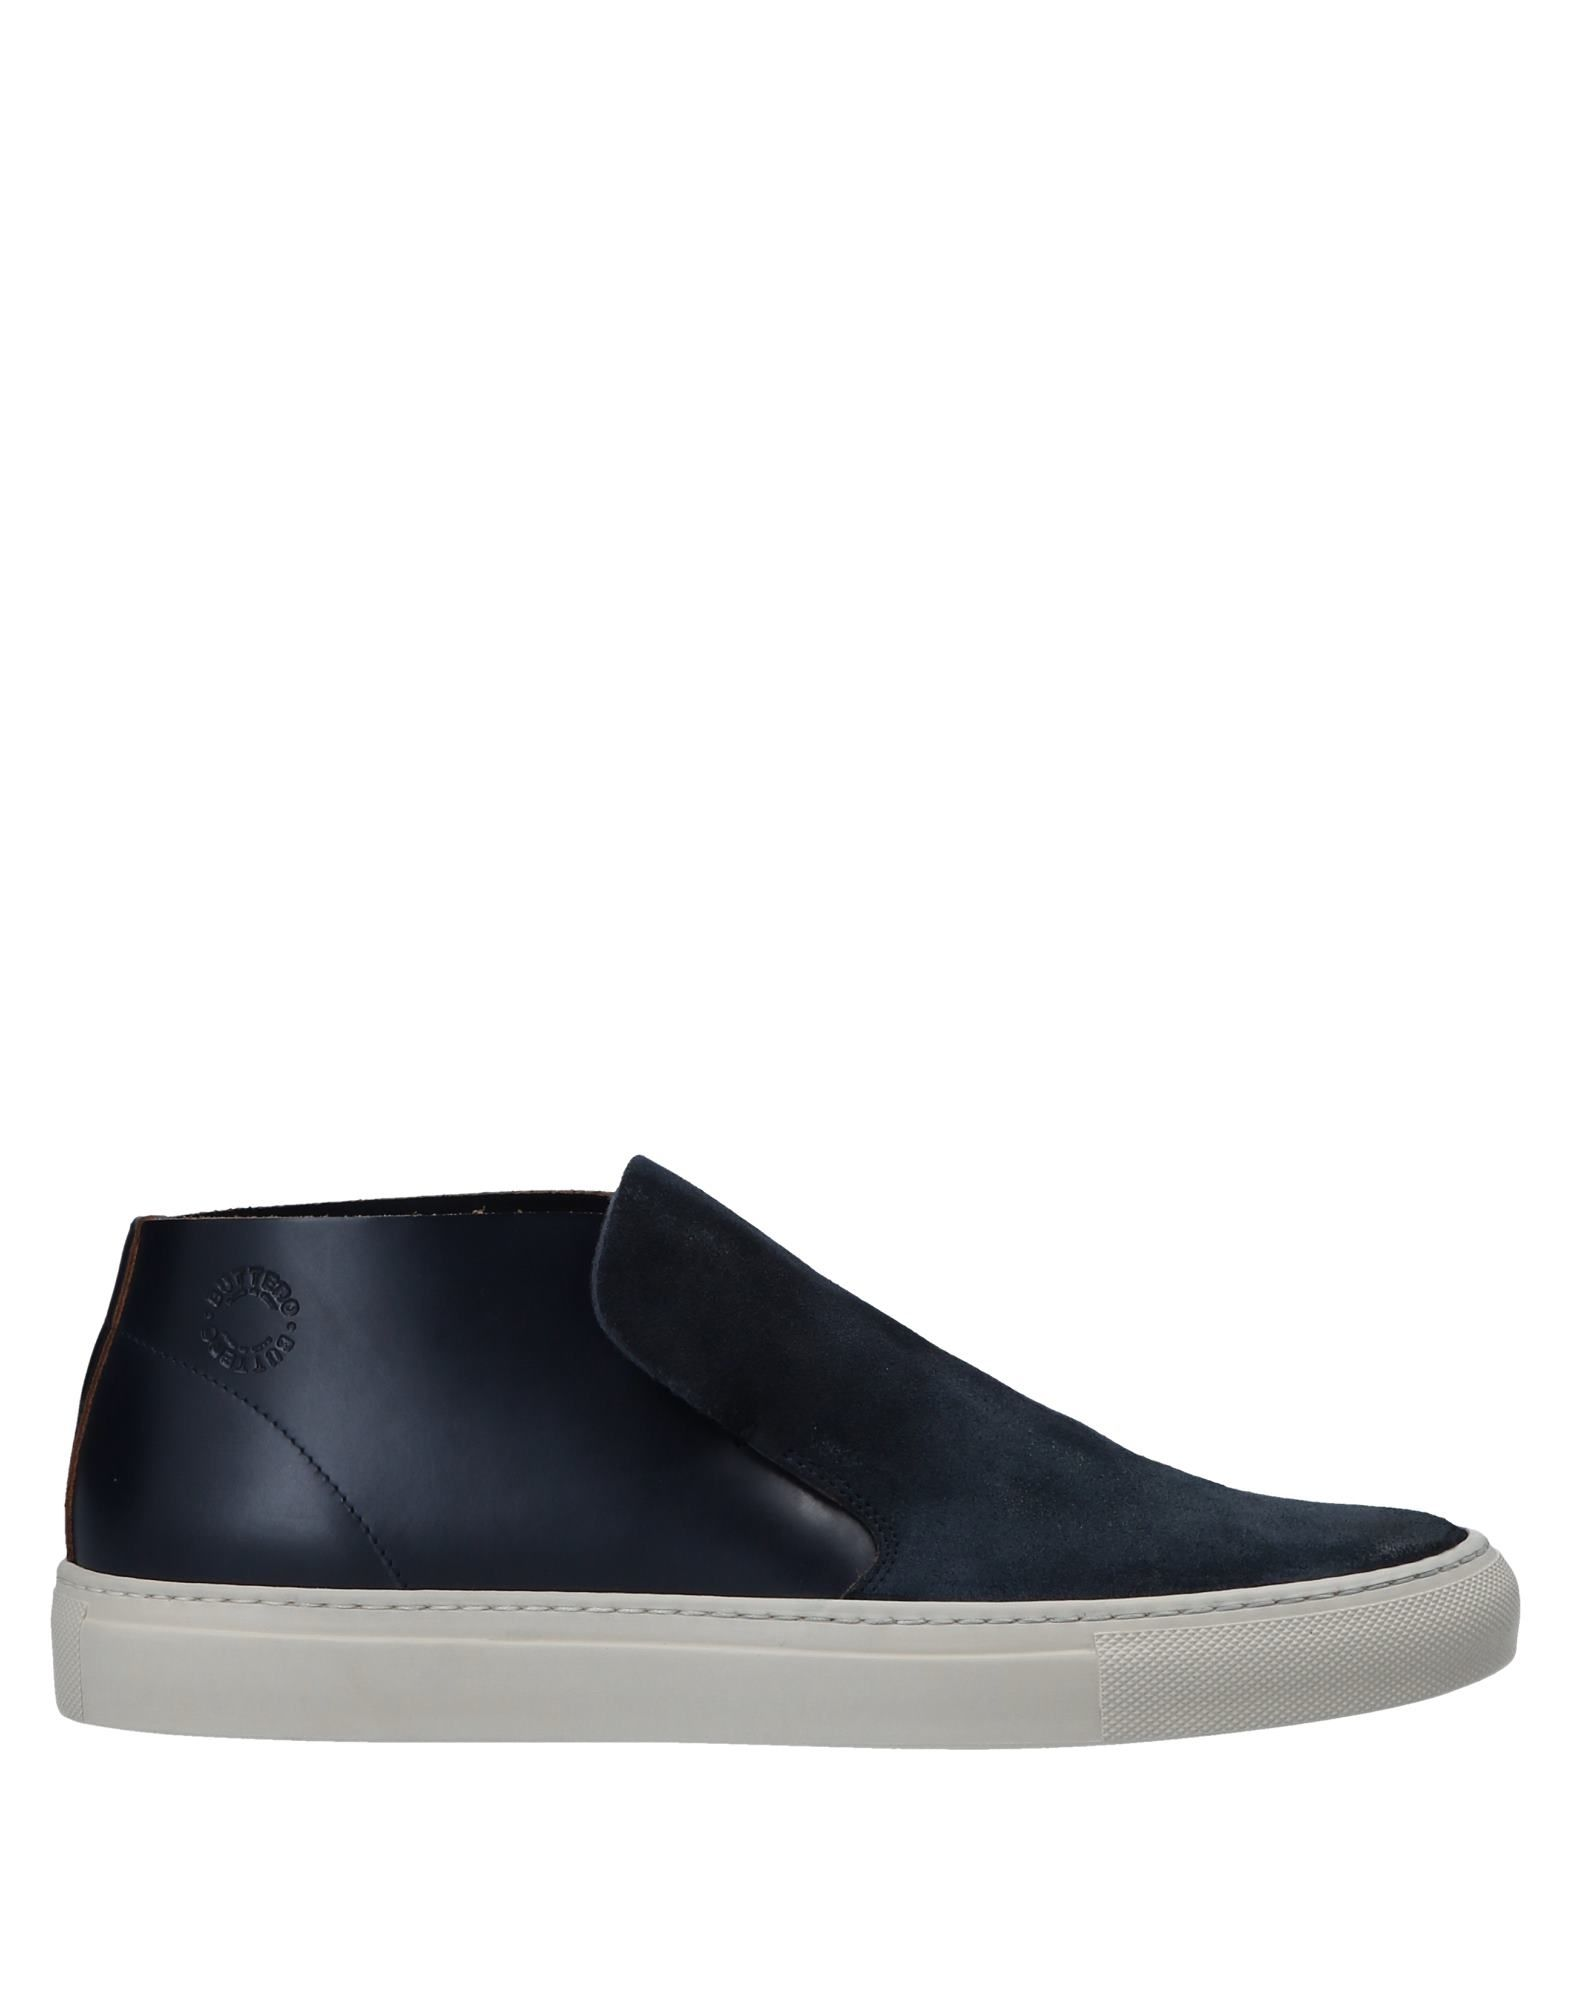 Buttero® Sneakers Herren  11553377PO Gute Qualität beliebte Schuhe